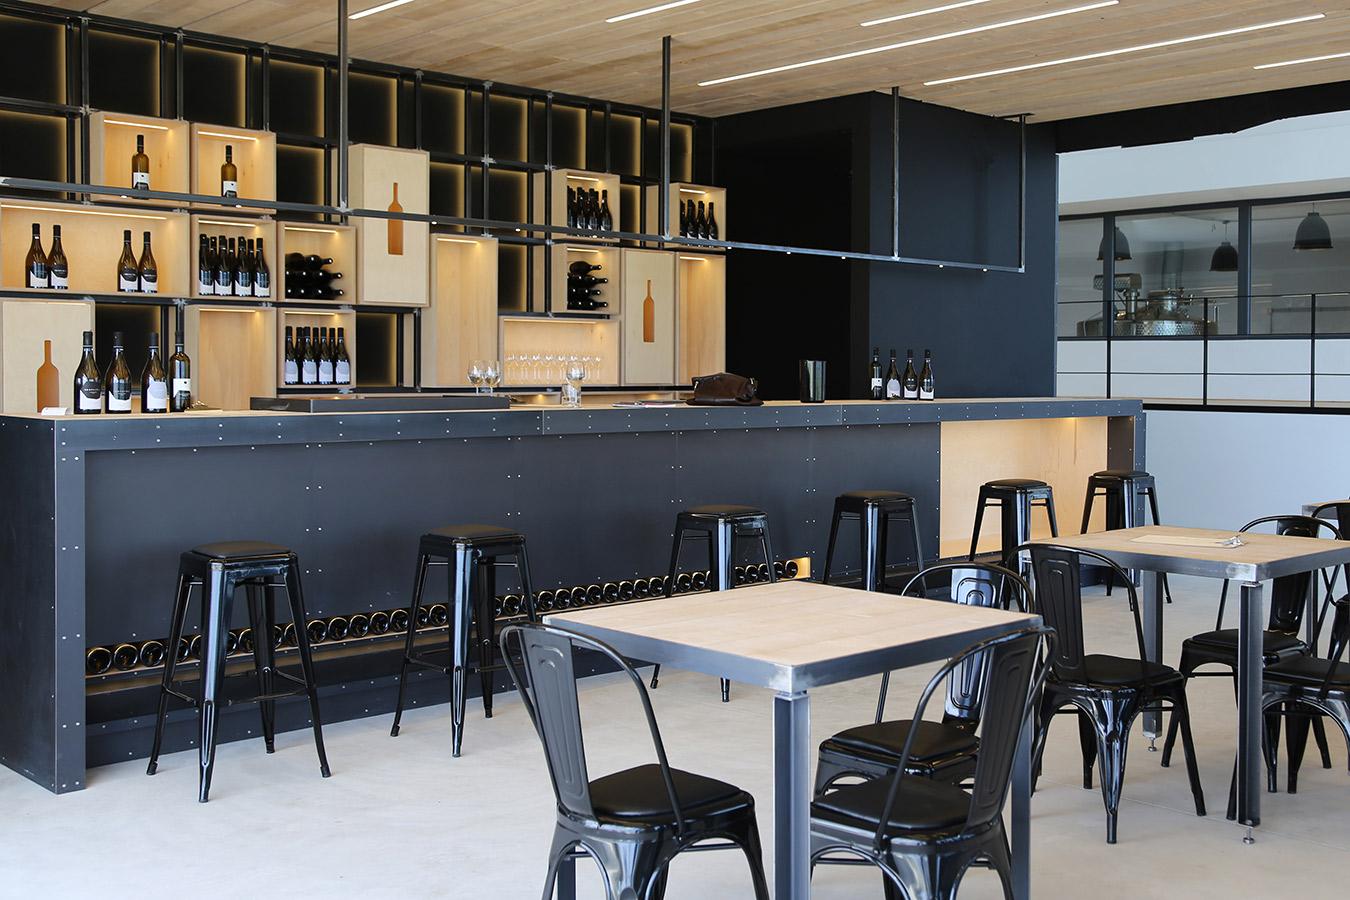 Winery in santorini island interior design